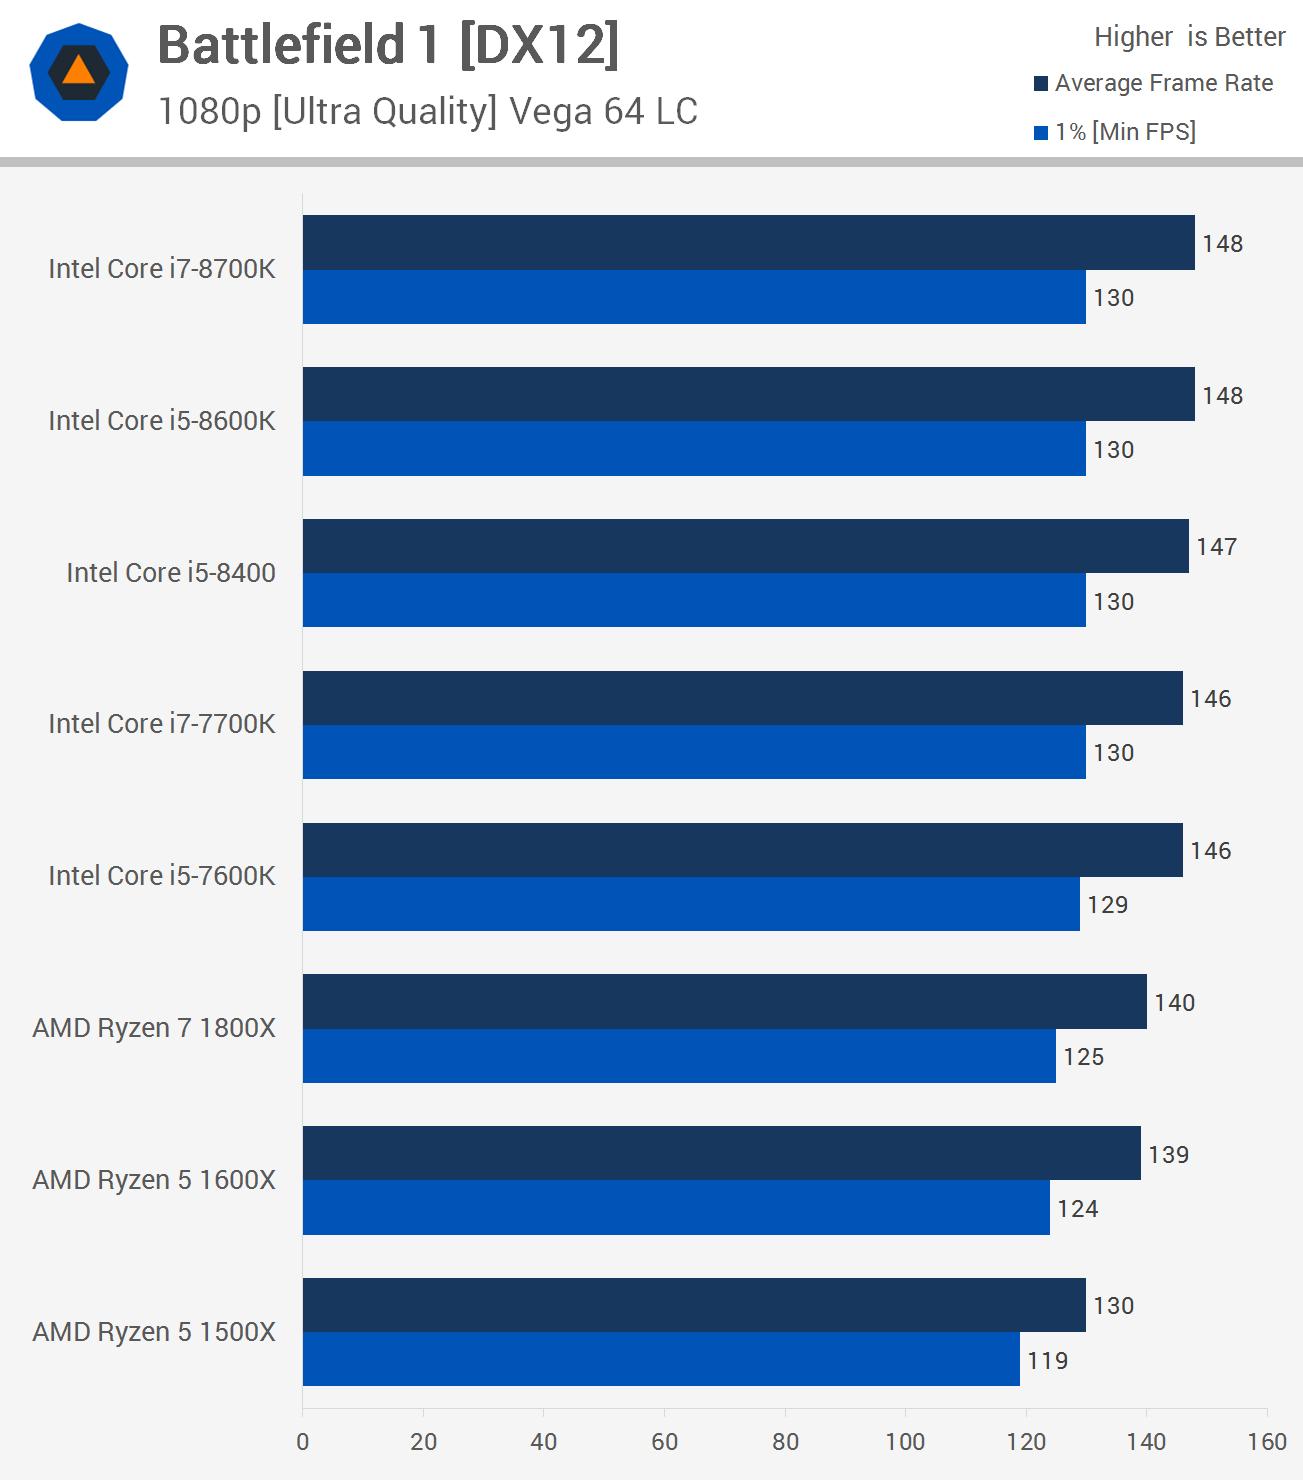 Intel Core i7-8700K ، i5-8600K ، 8400 مقابل AMD Ryzen 7 1800X ، R5 1600X ، 1500X 3